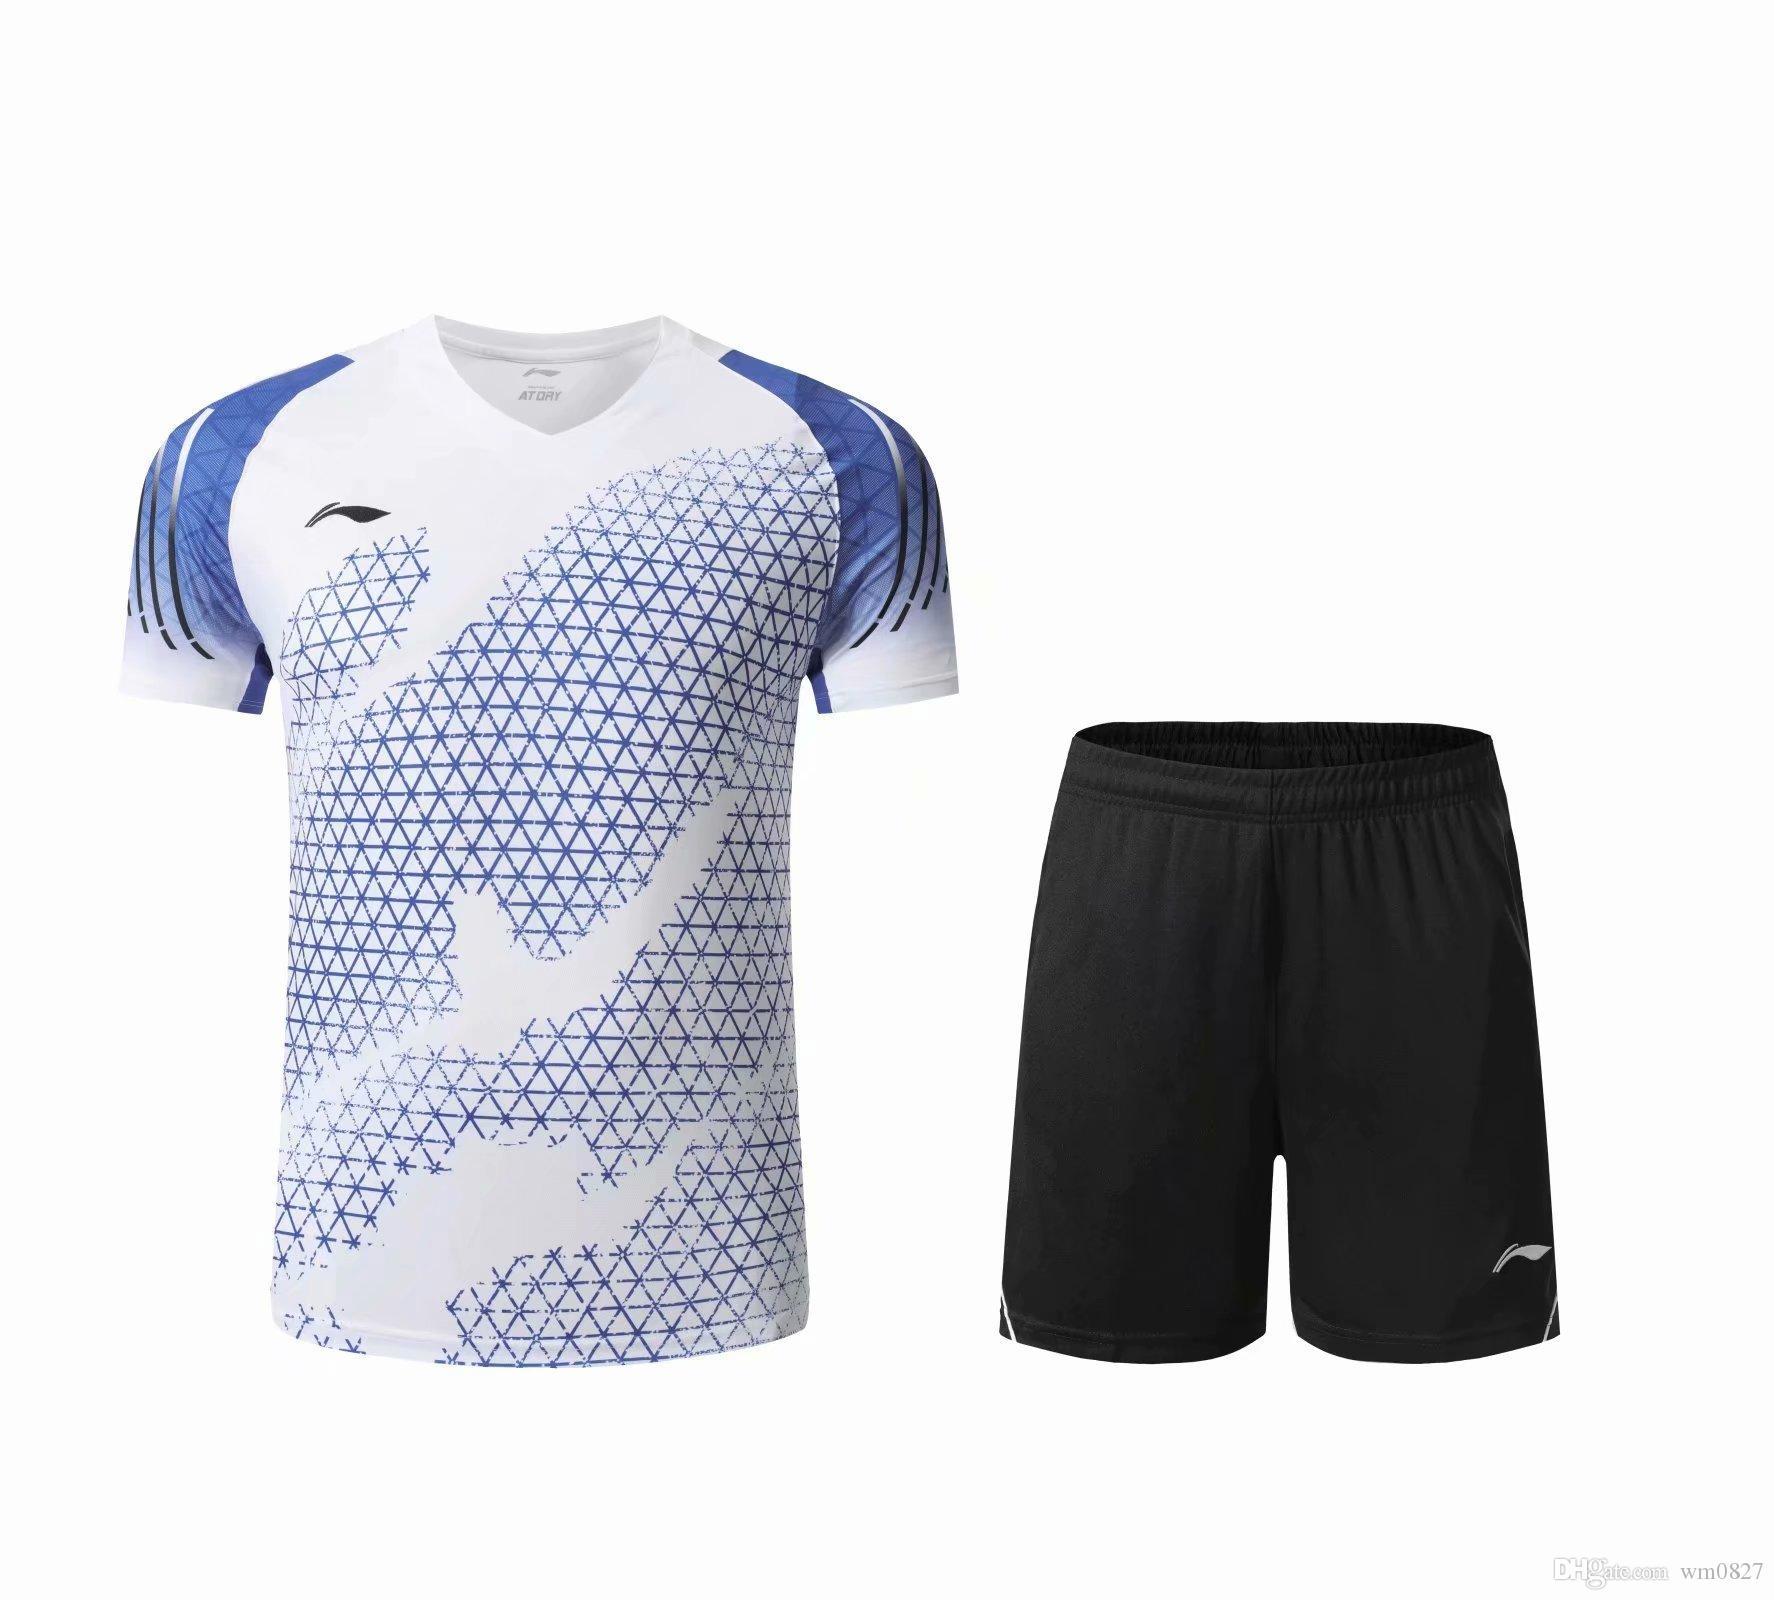 New 2020 Li-Ning badminton wear t-shirts men/women clothes,polyeater breathable table tennis jersey short sleeve T-shirt,tennis shirt